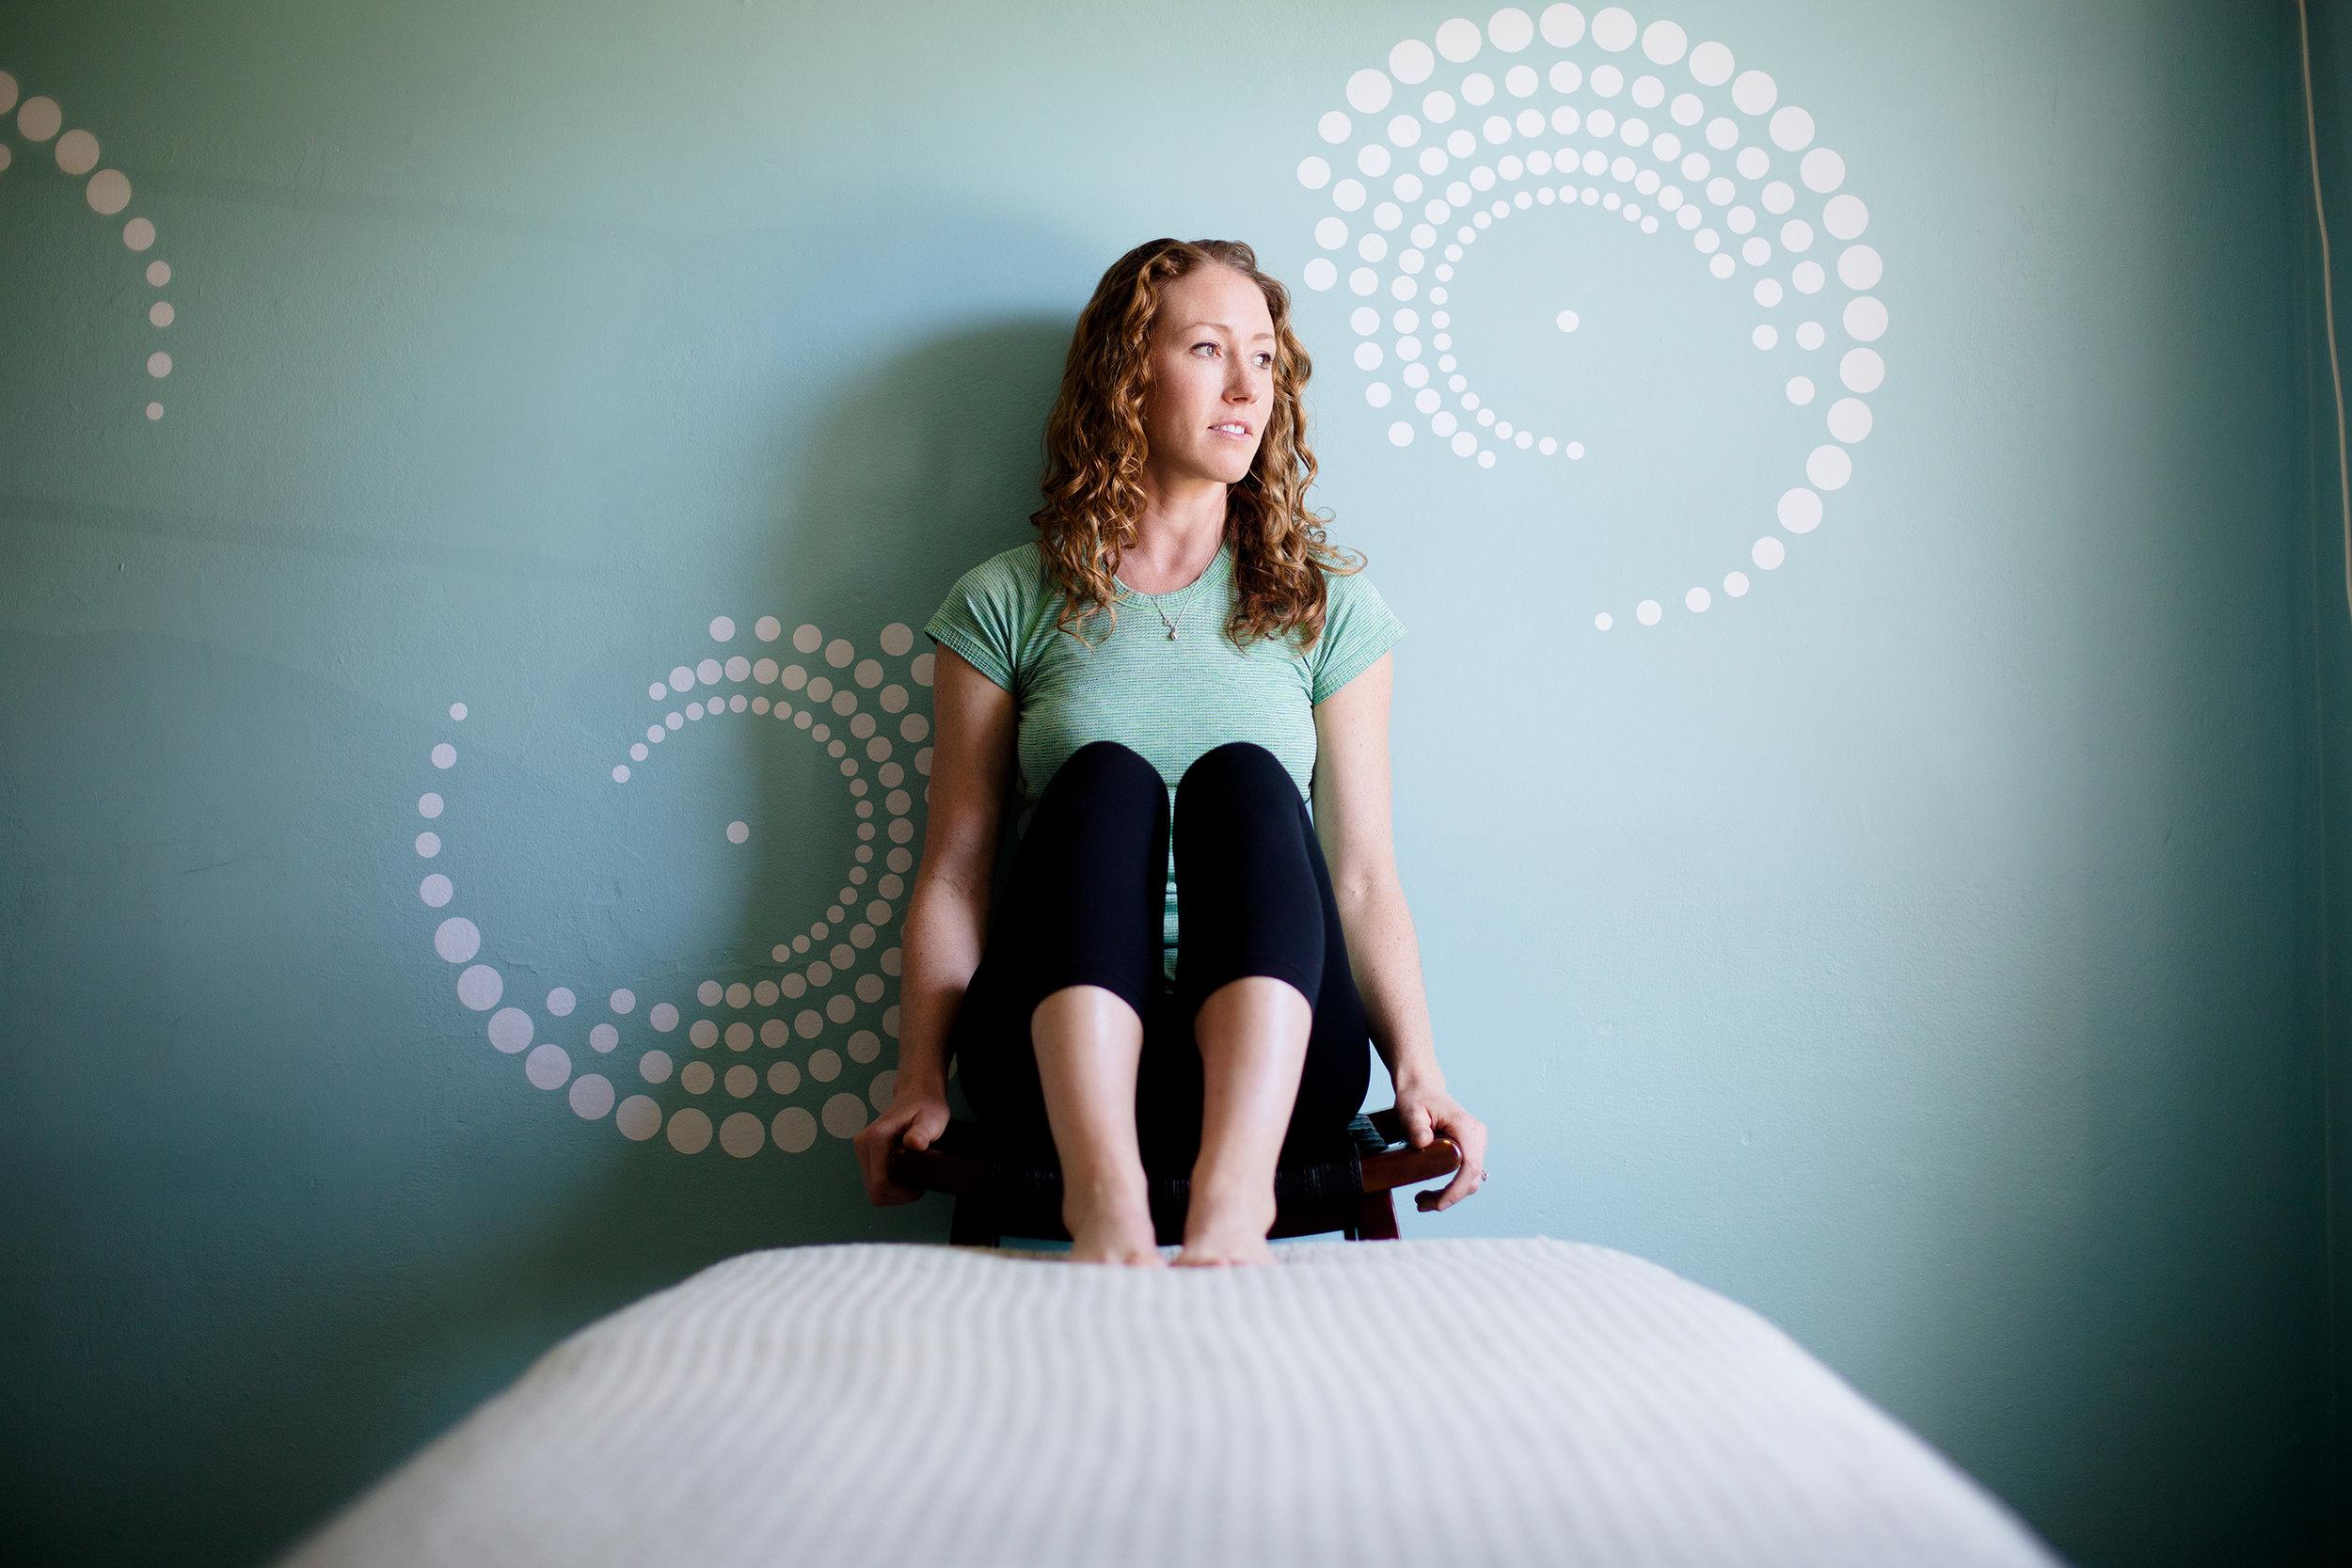 Kaylie sanders, CMT